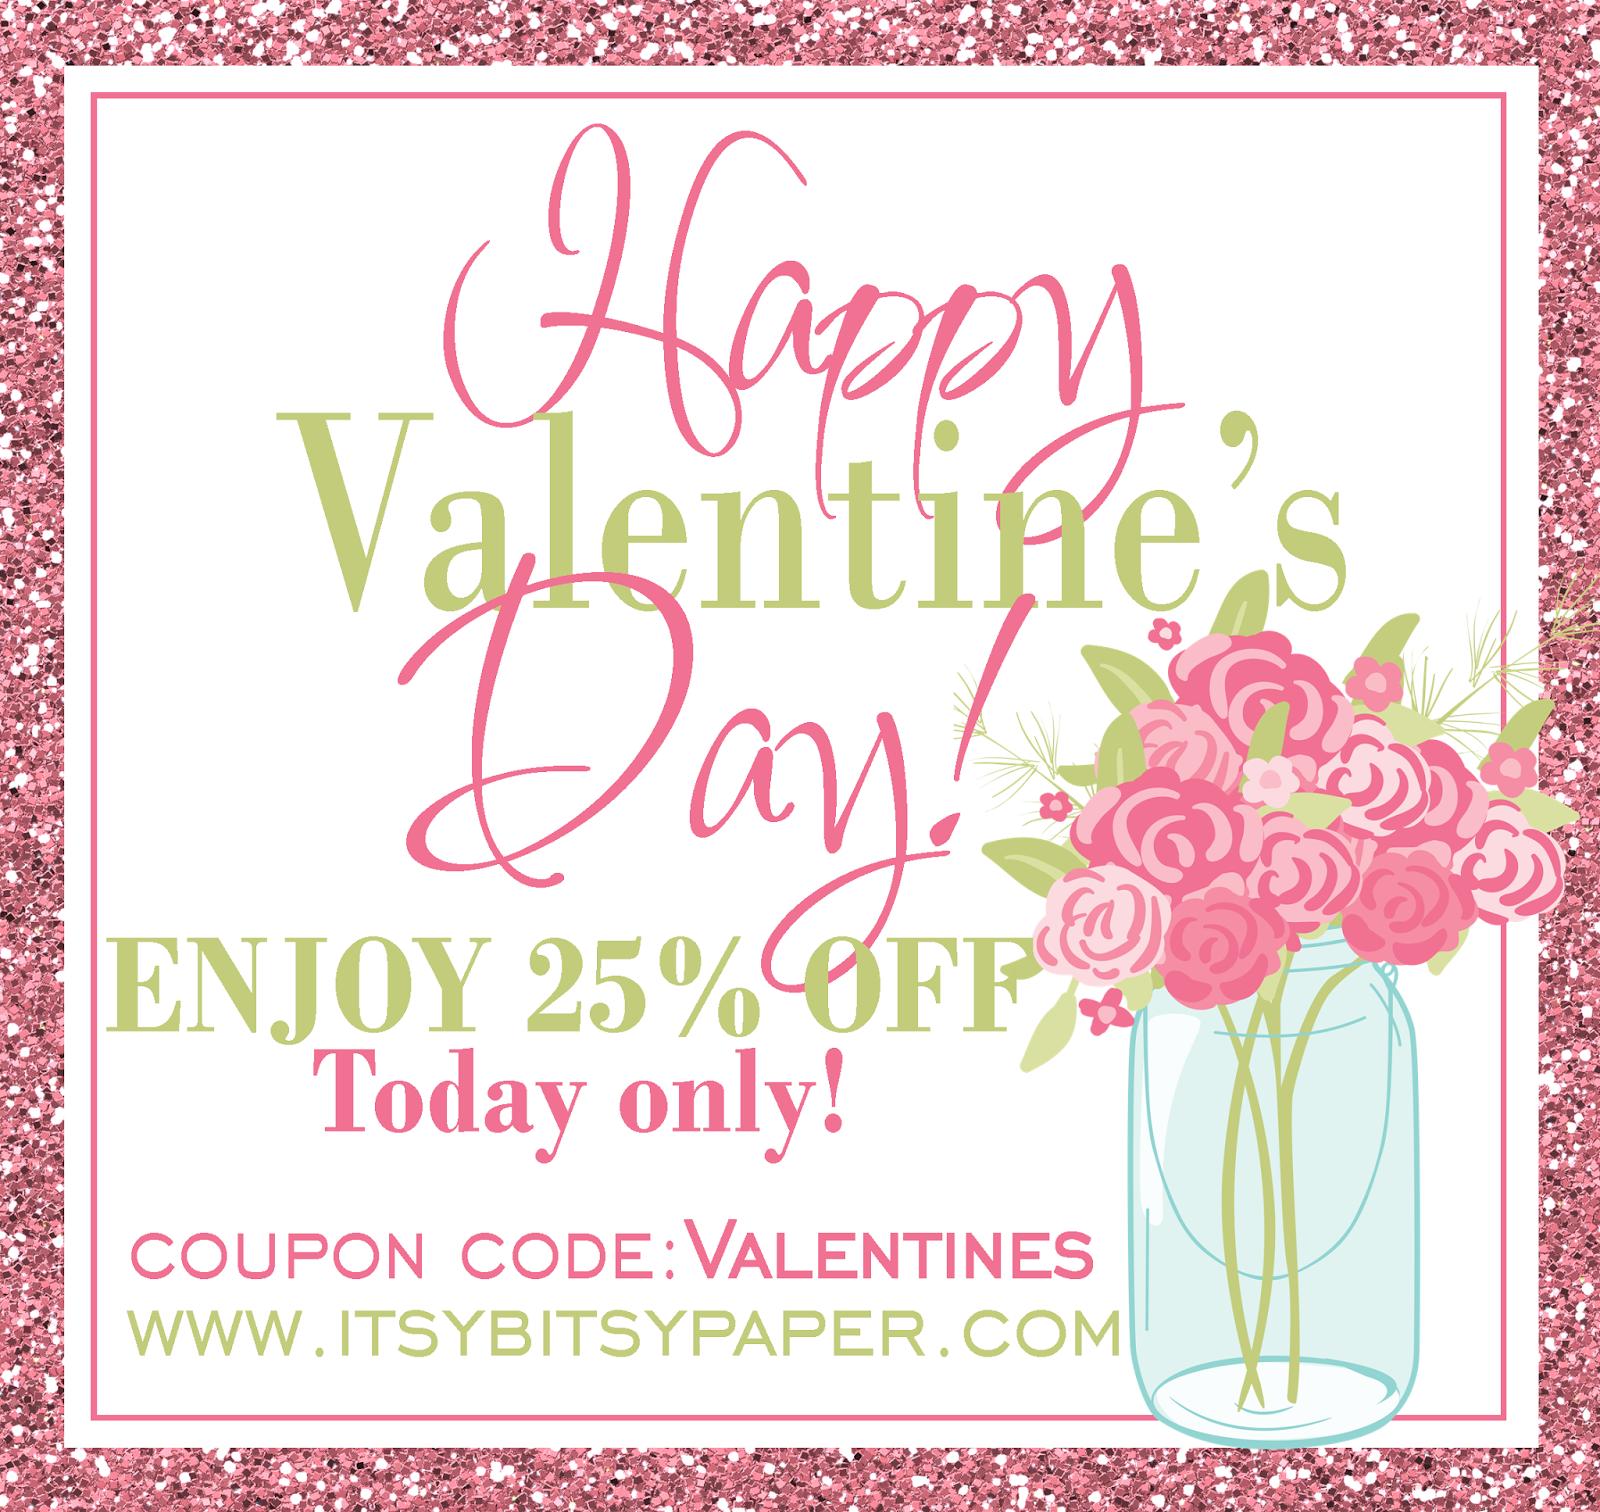 www.itsybitsypaper.com